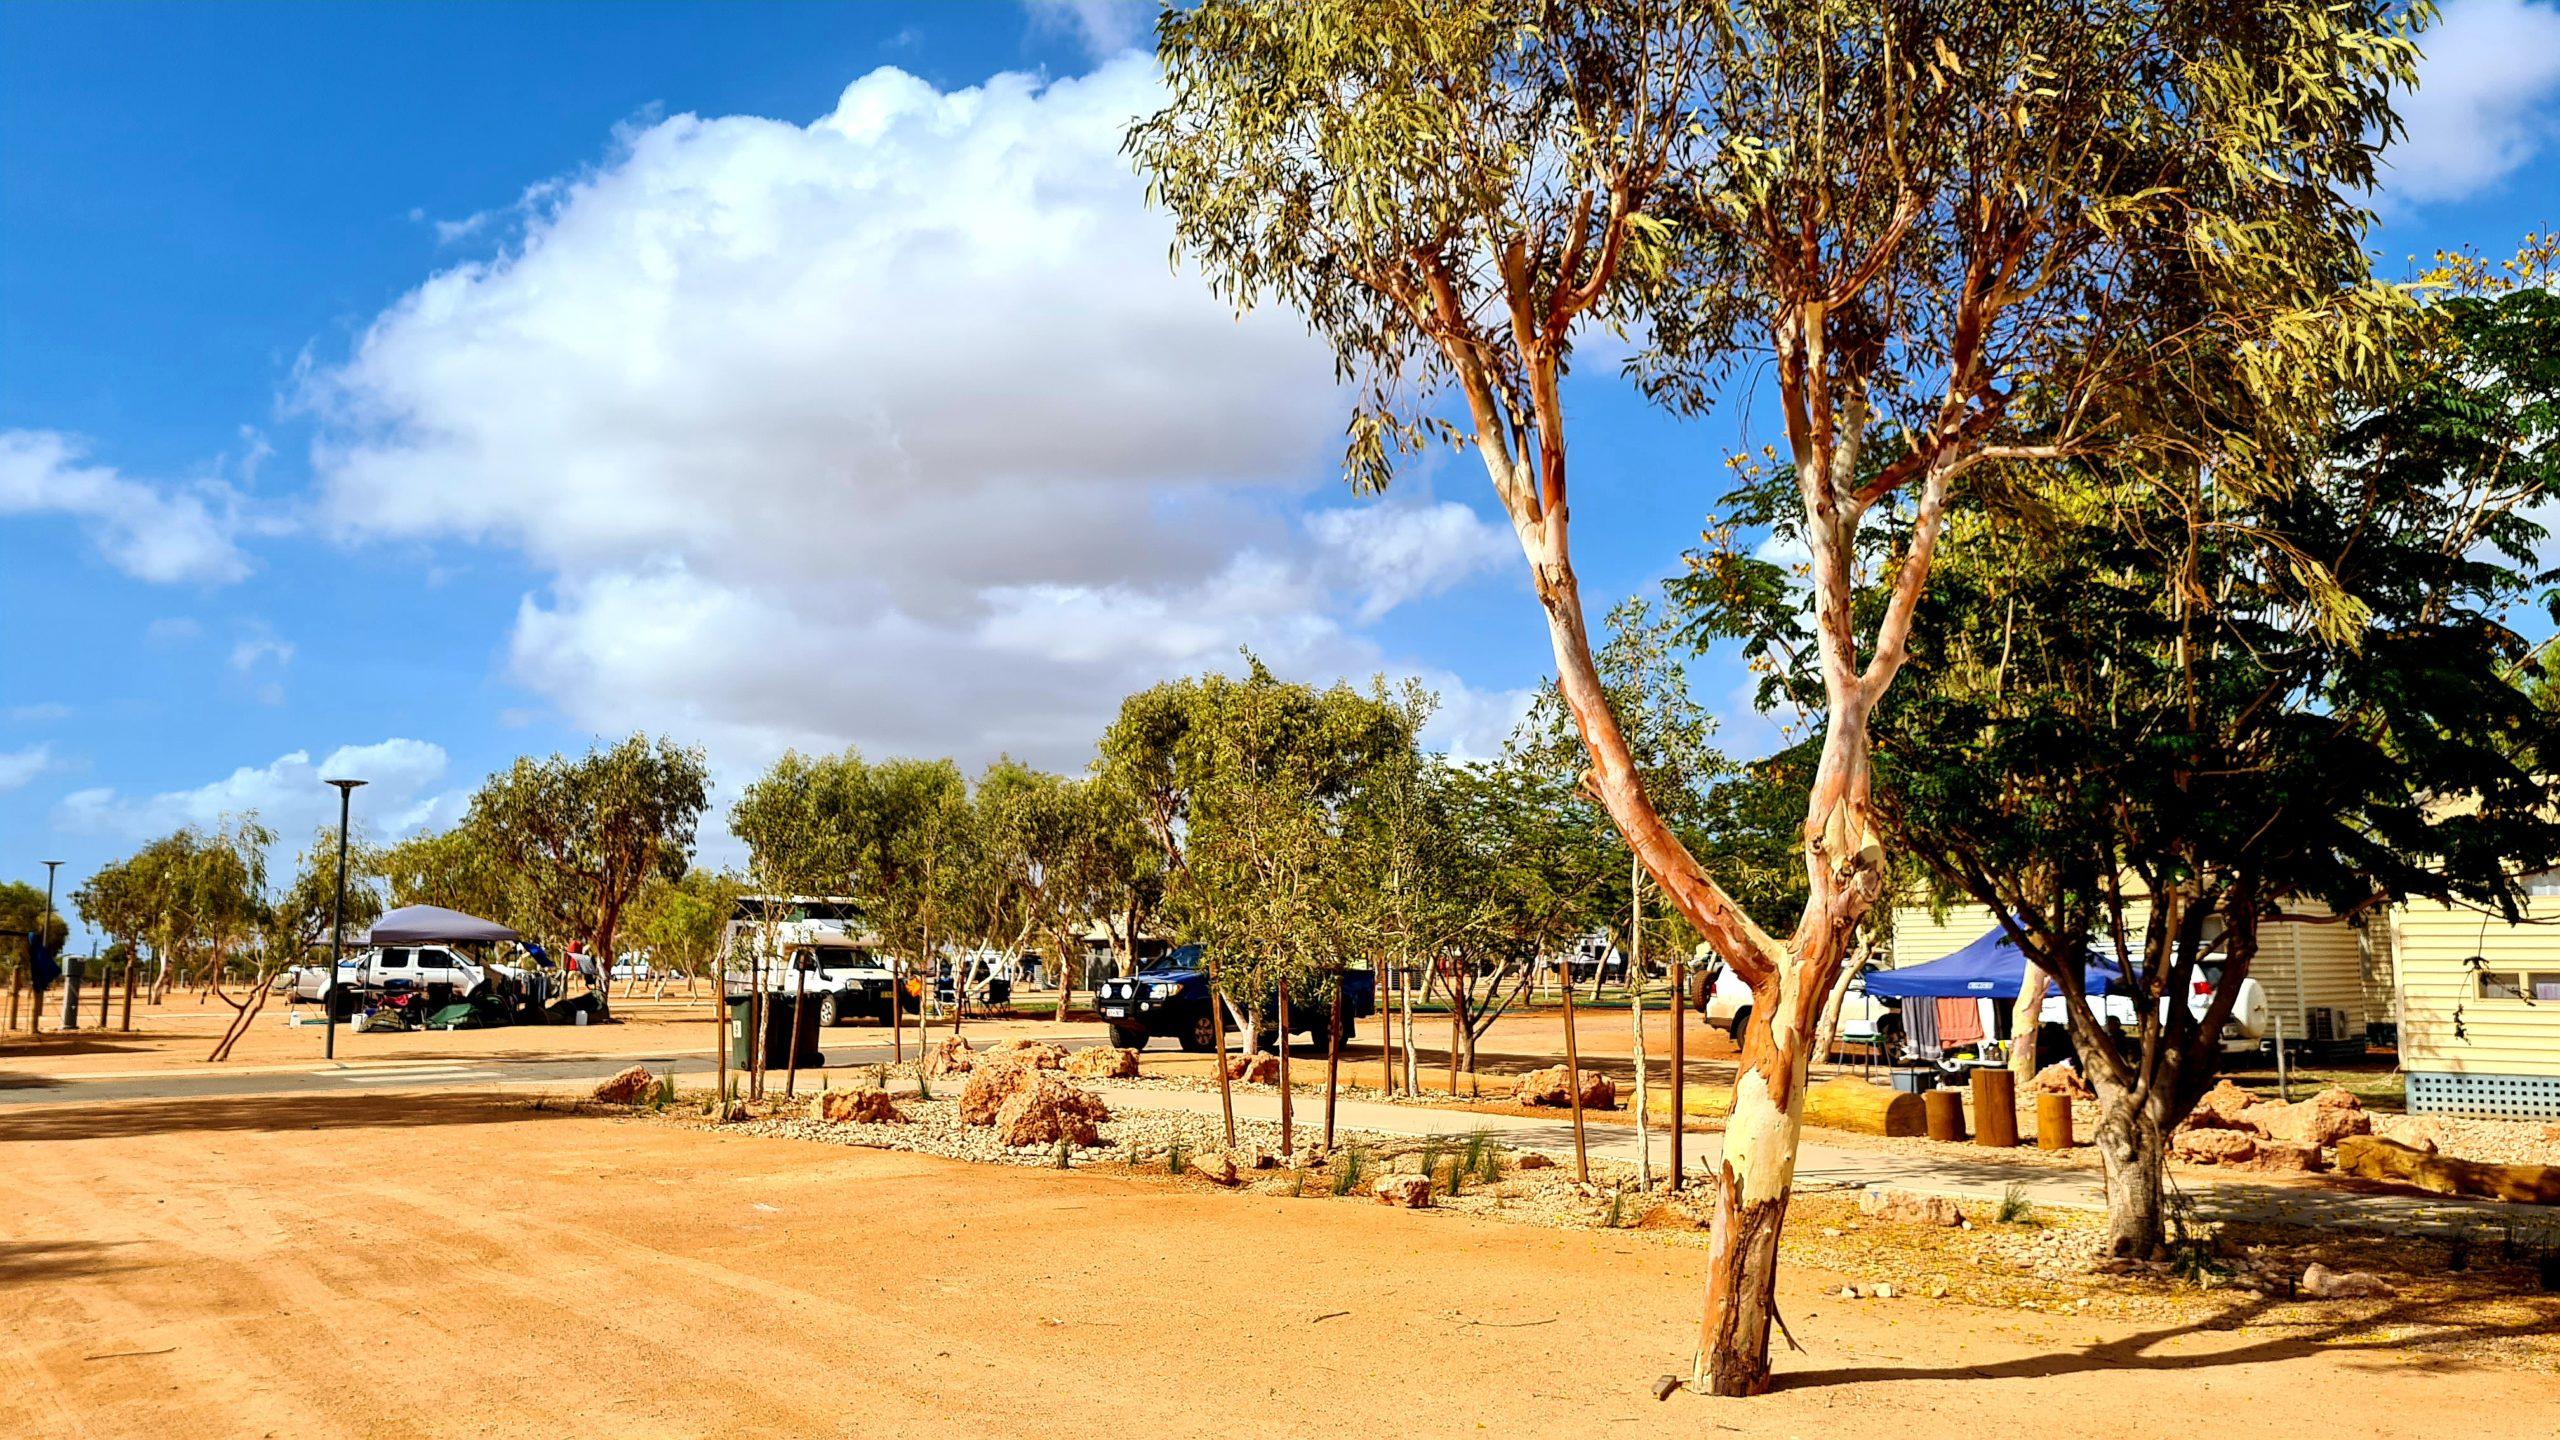 Caravan Park in Kalbarri